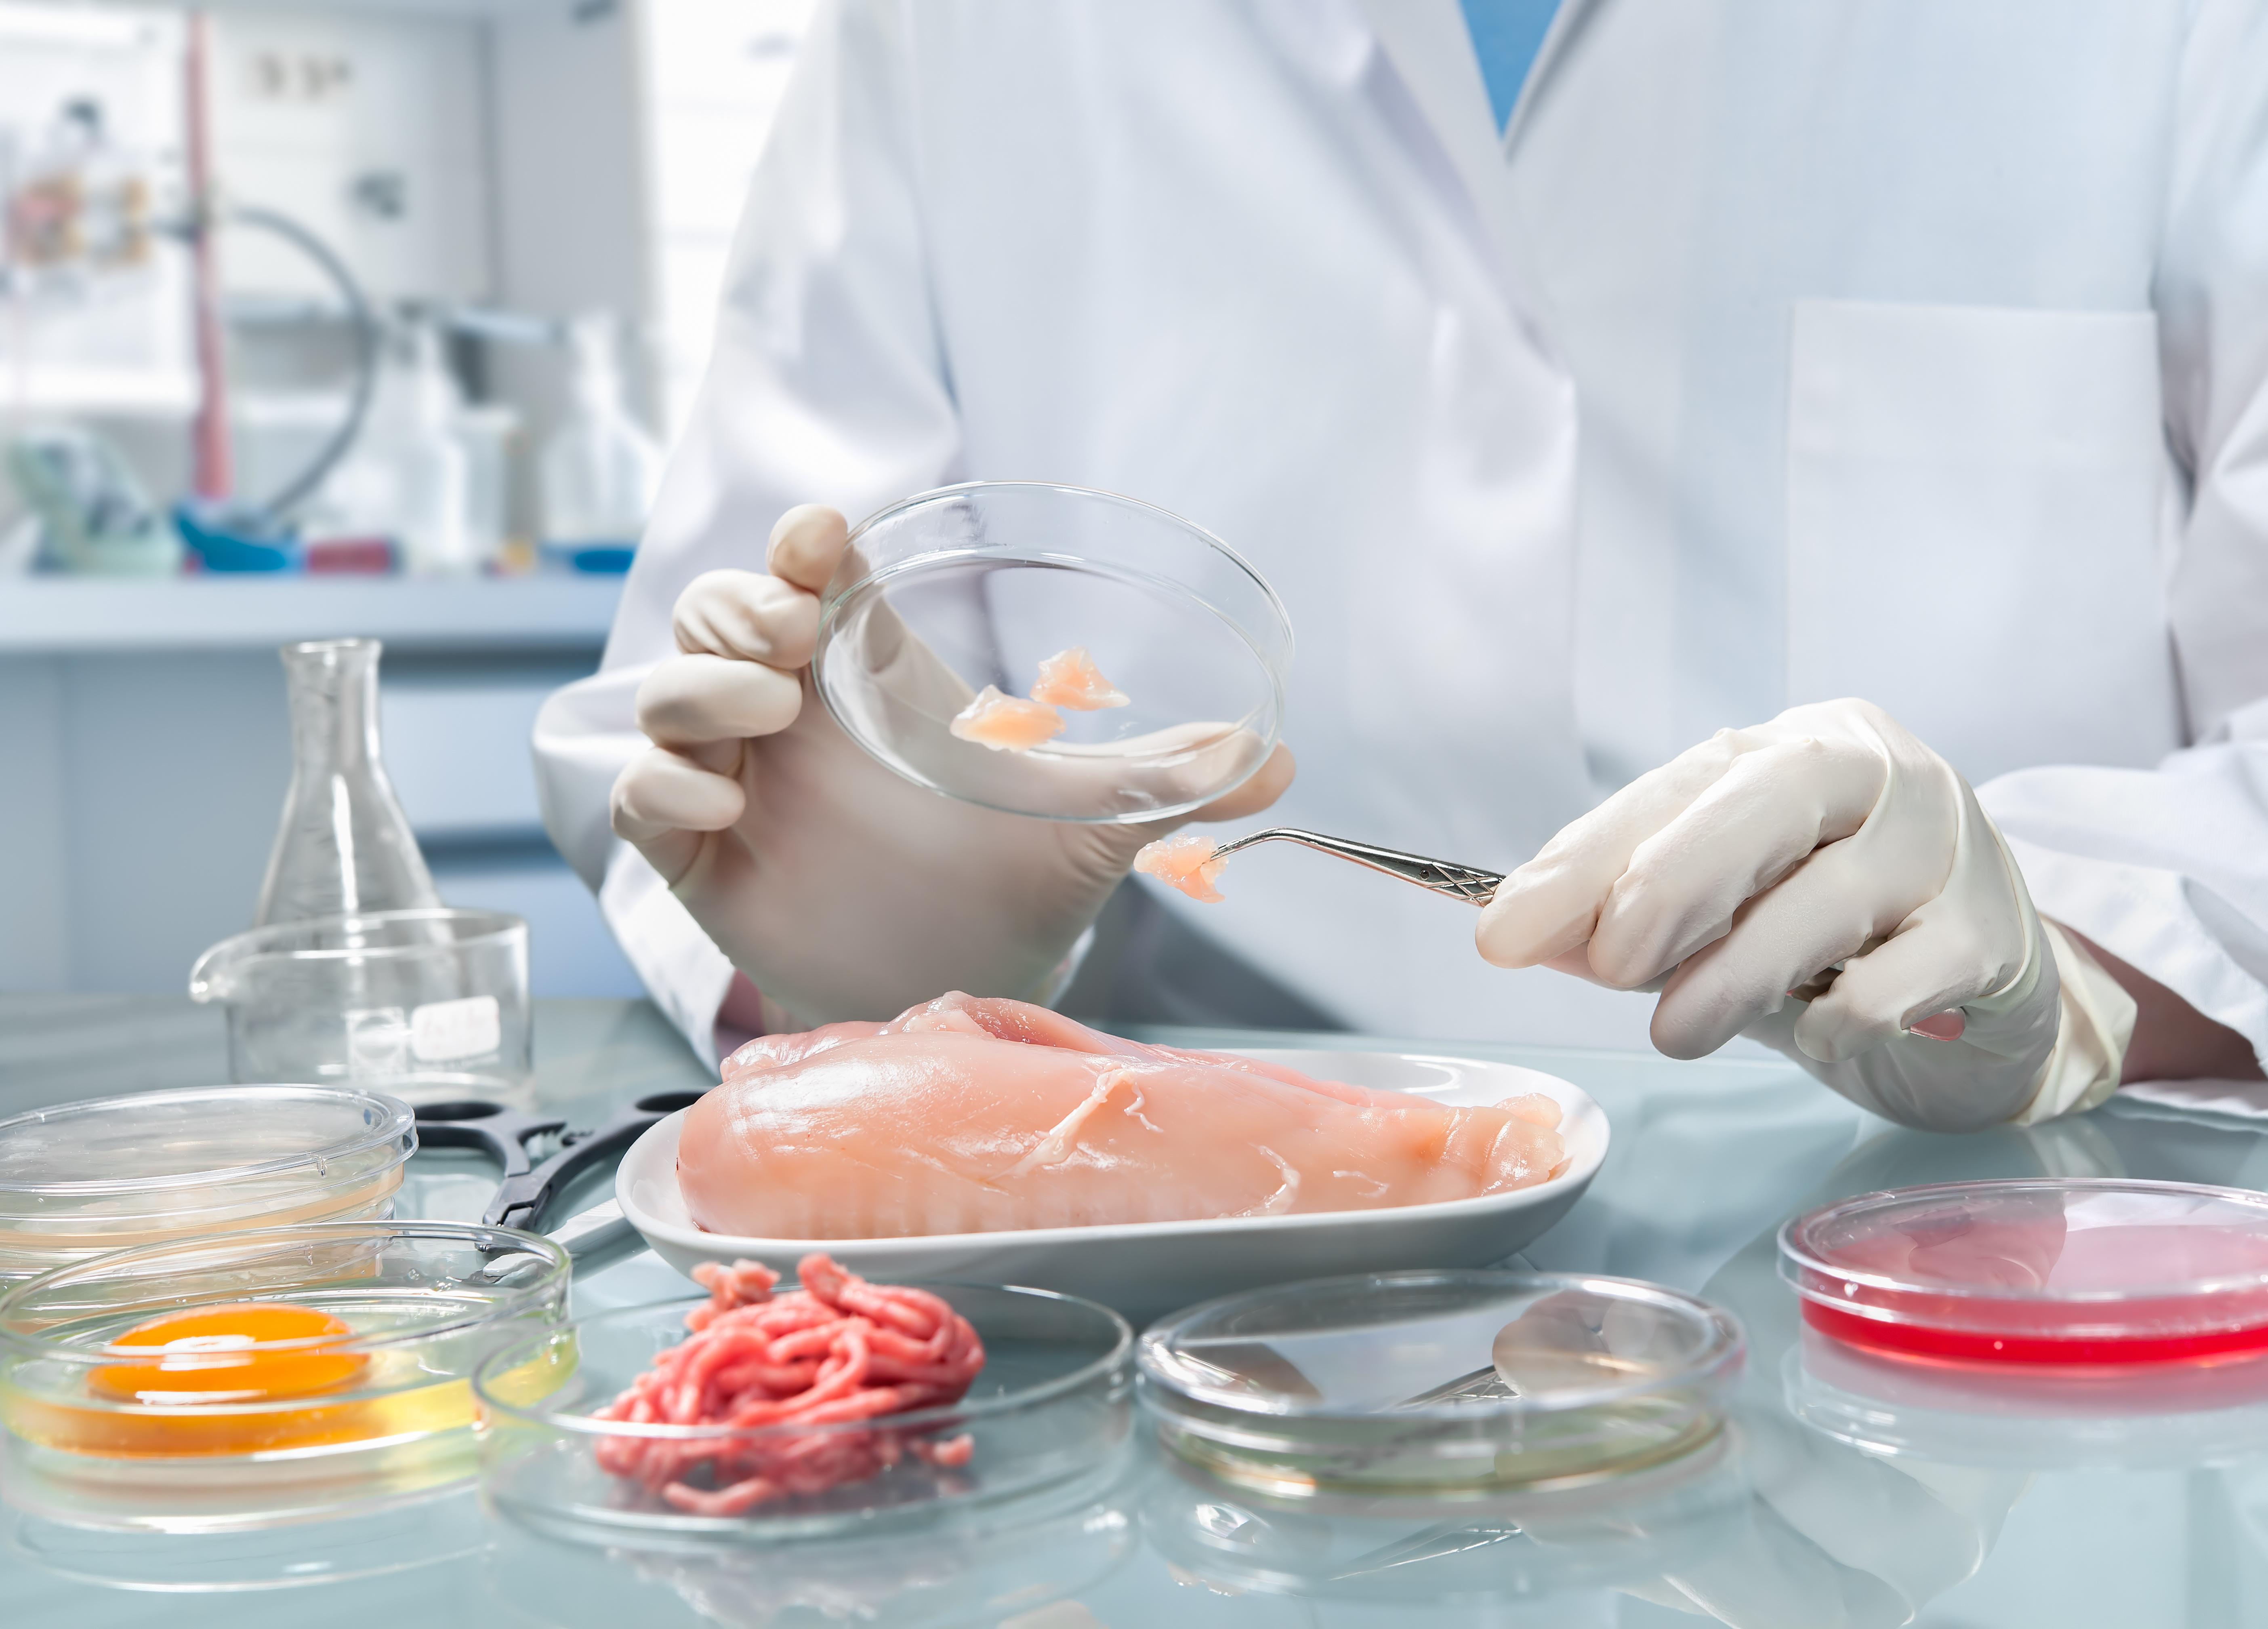 ProteoSense: Making Foodborne Illness a Thing of the Past